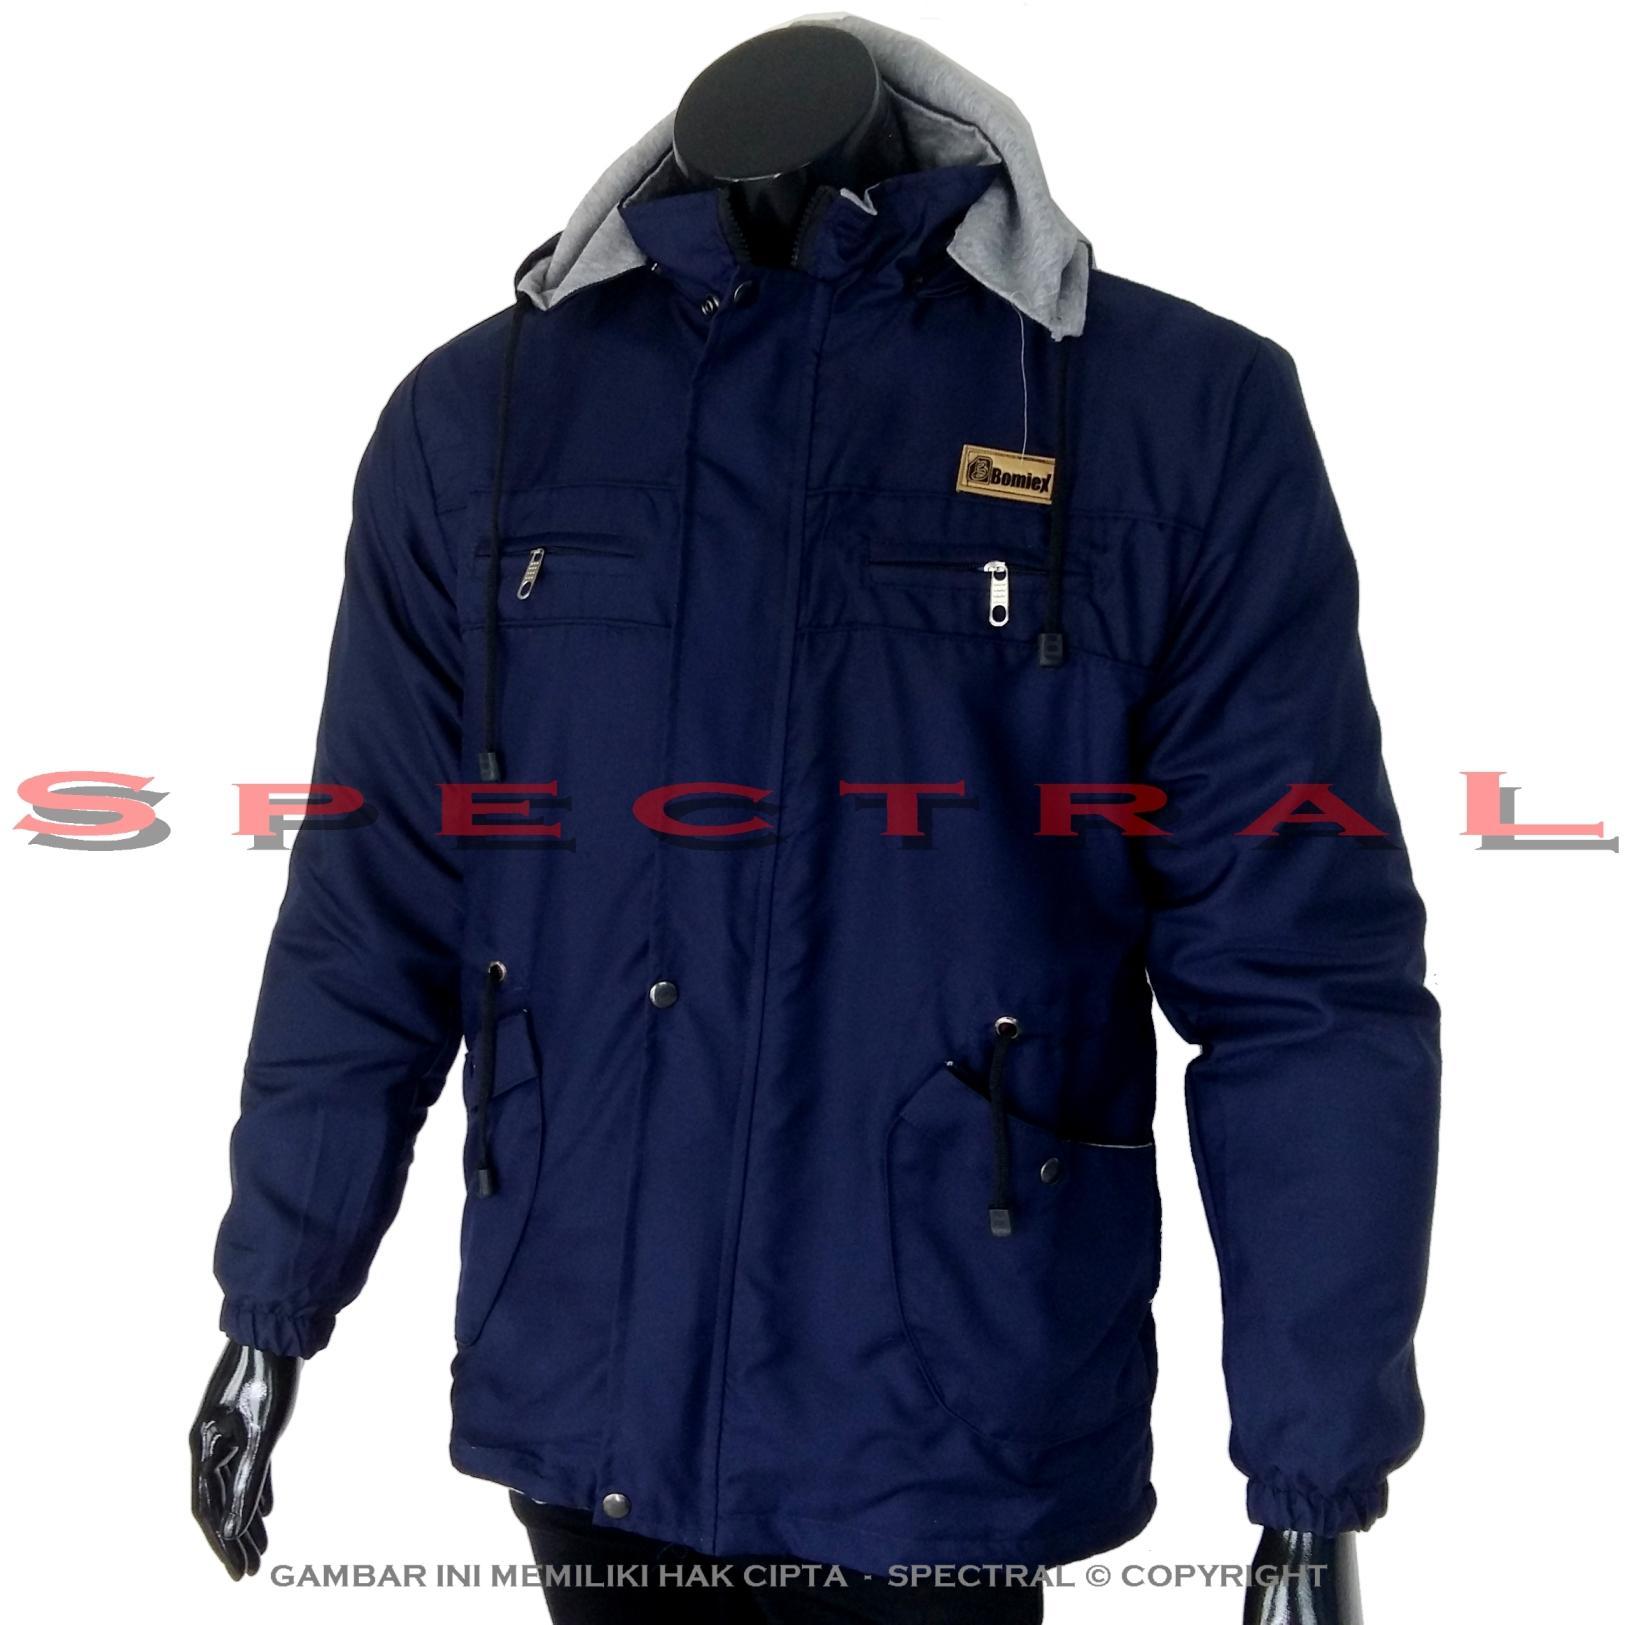 Spectral – Jaket PARKA Biru Navy Dongker Parasut Bolak Balik Jacket Sweater Hoodie Switer Jeans Parka Switer Bomber